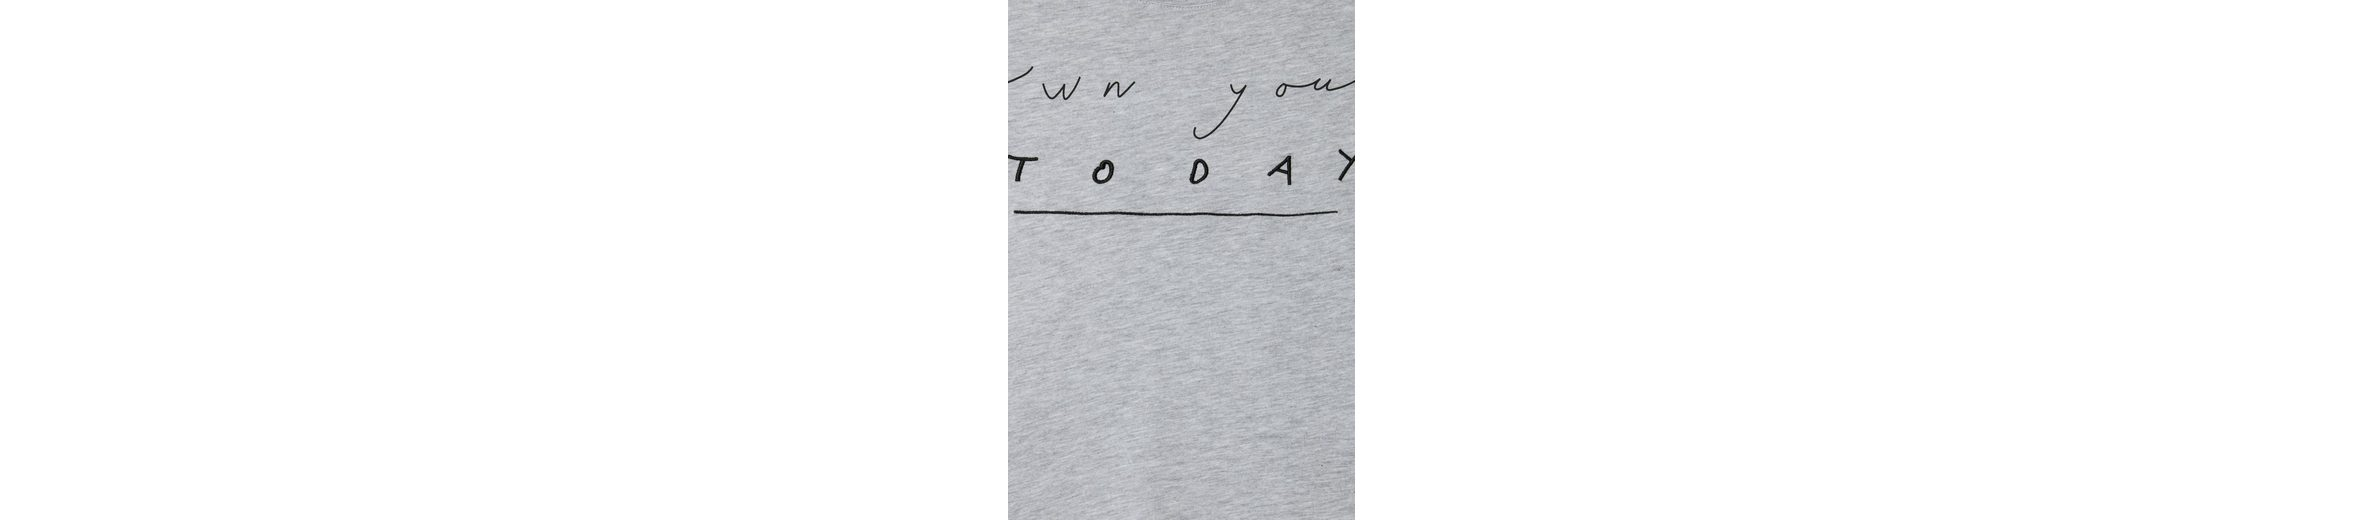 Perfekt Günstig Online fransa Blusenshirt Miartwork Günstig Kaufen Ebay Billig Verkauf Bestseller Echt Günstiger Preis ho9DndNKZI